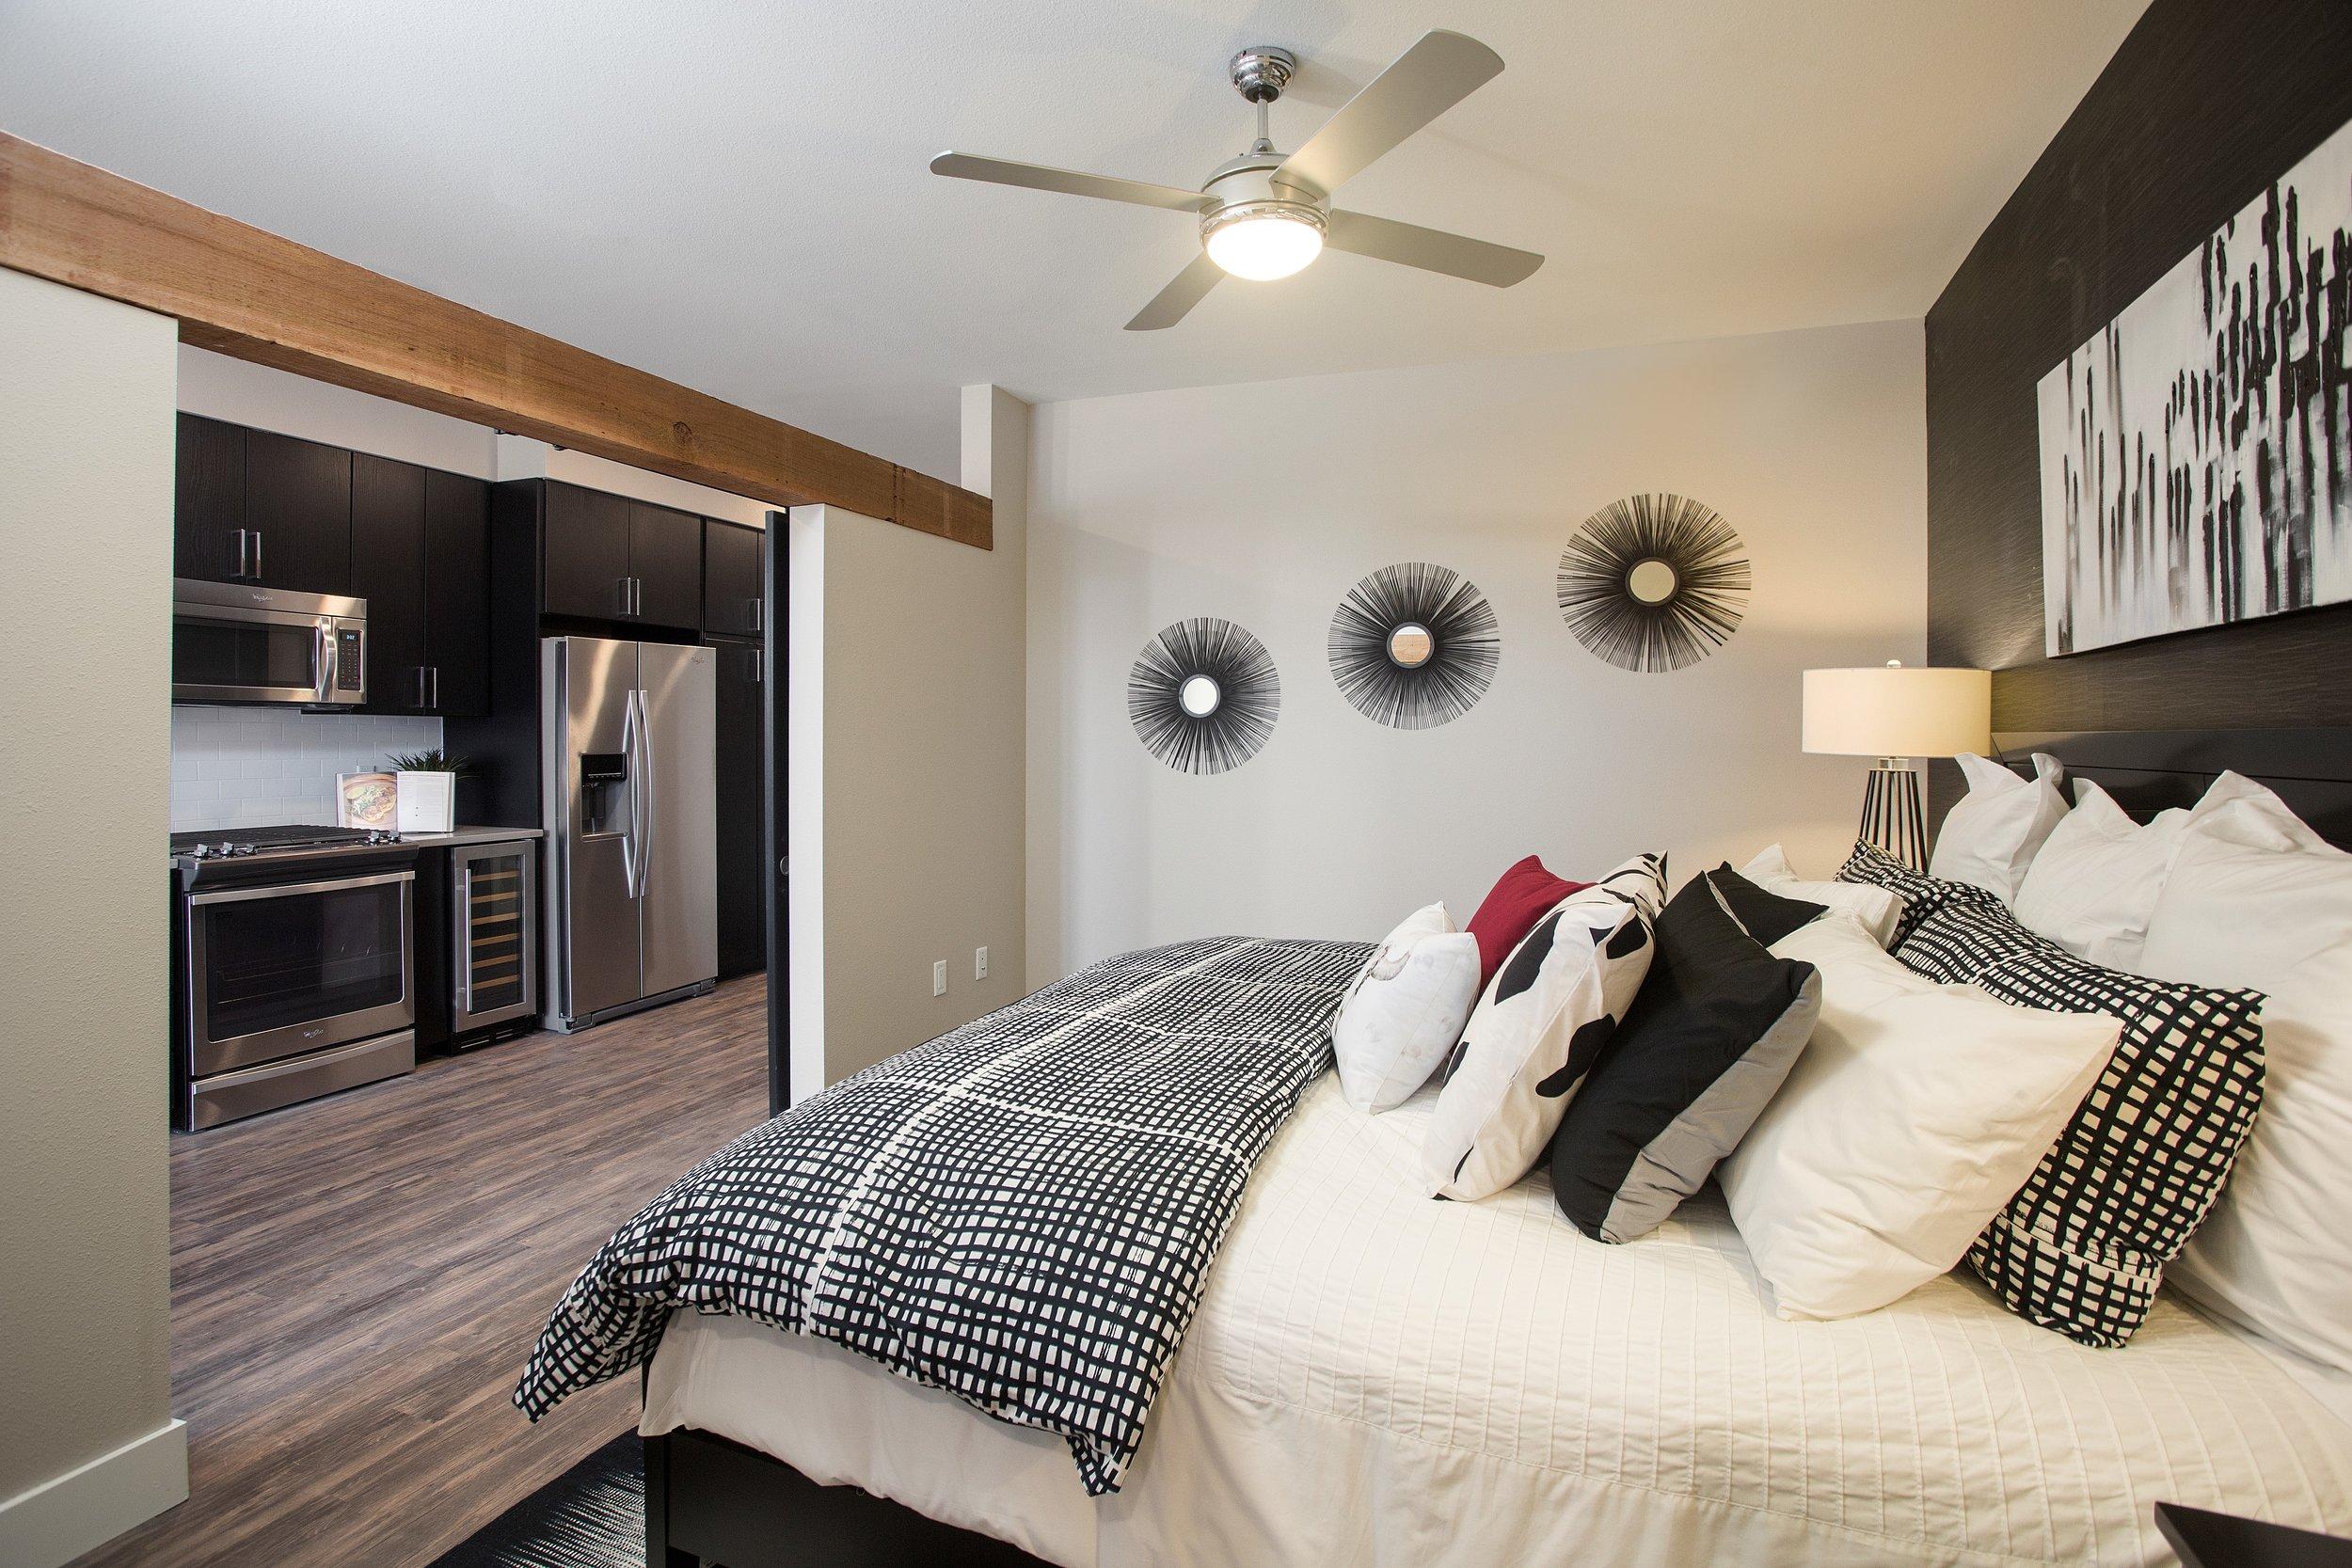 05-Two-Tone Paint Palette Bedrooms.jpg